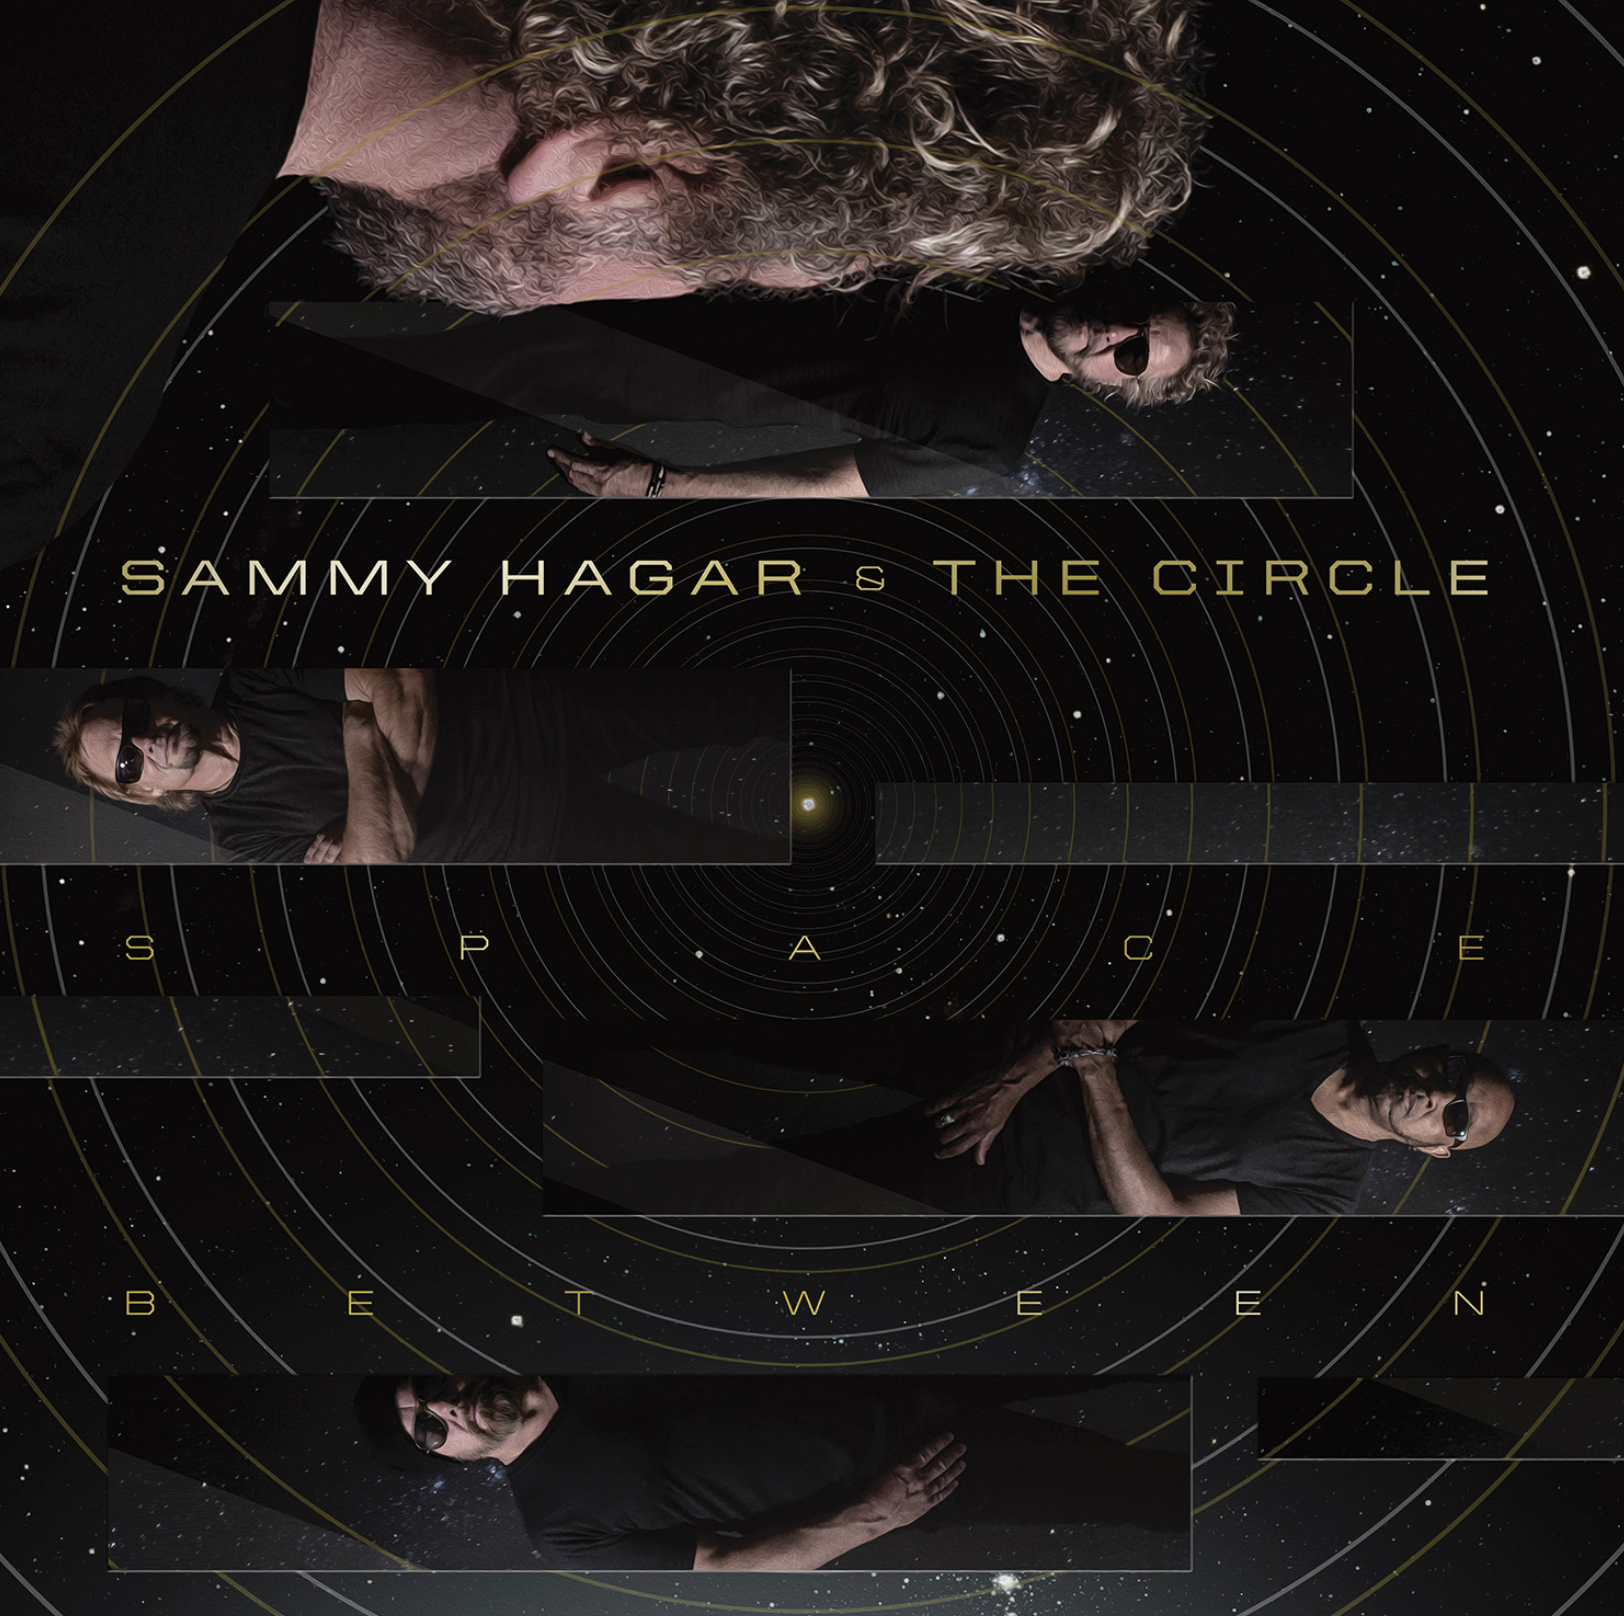 Sammy Hagar Tour 2020 Sammy Hagar Announces Album, Tour   Best Classic Bands